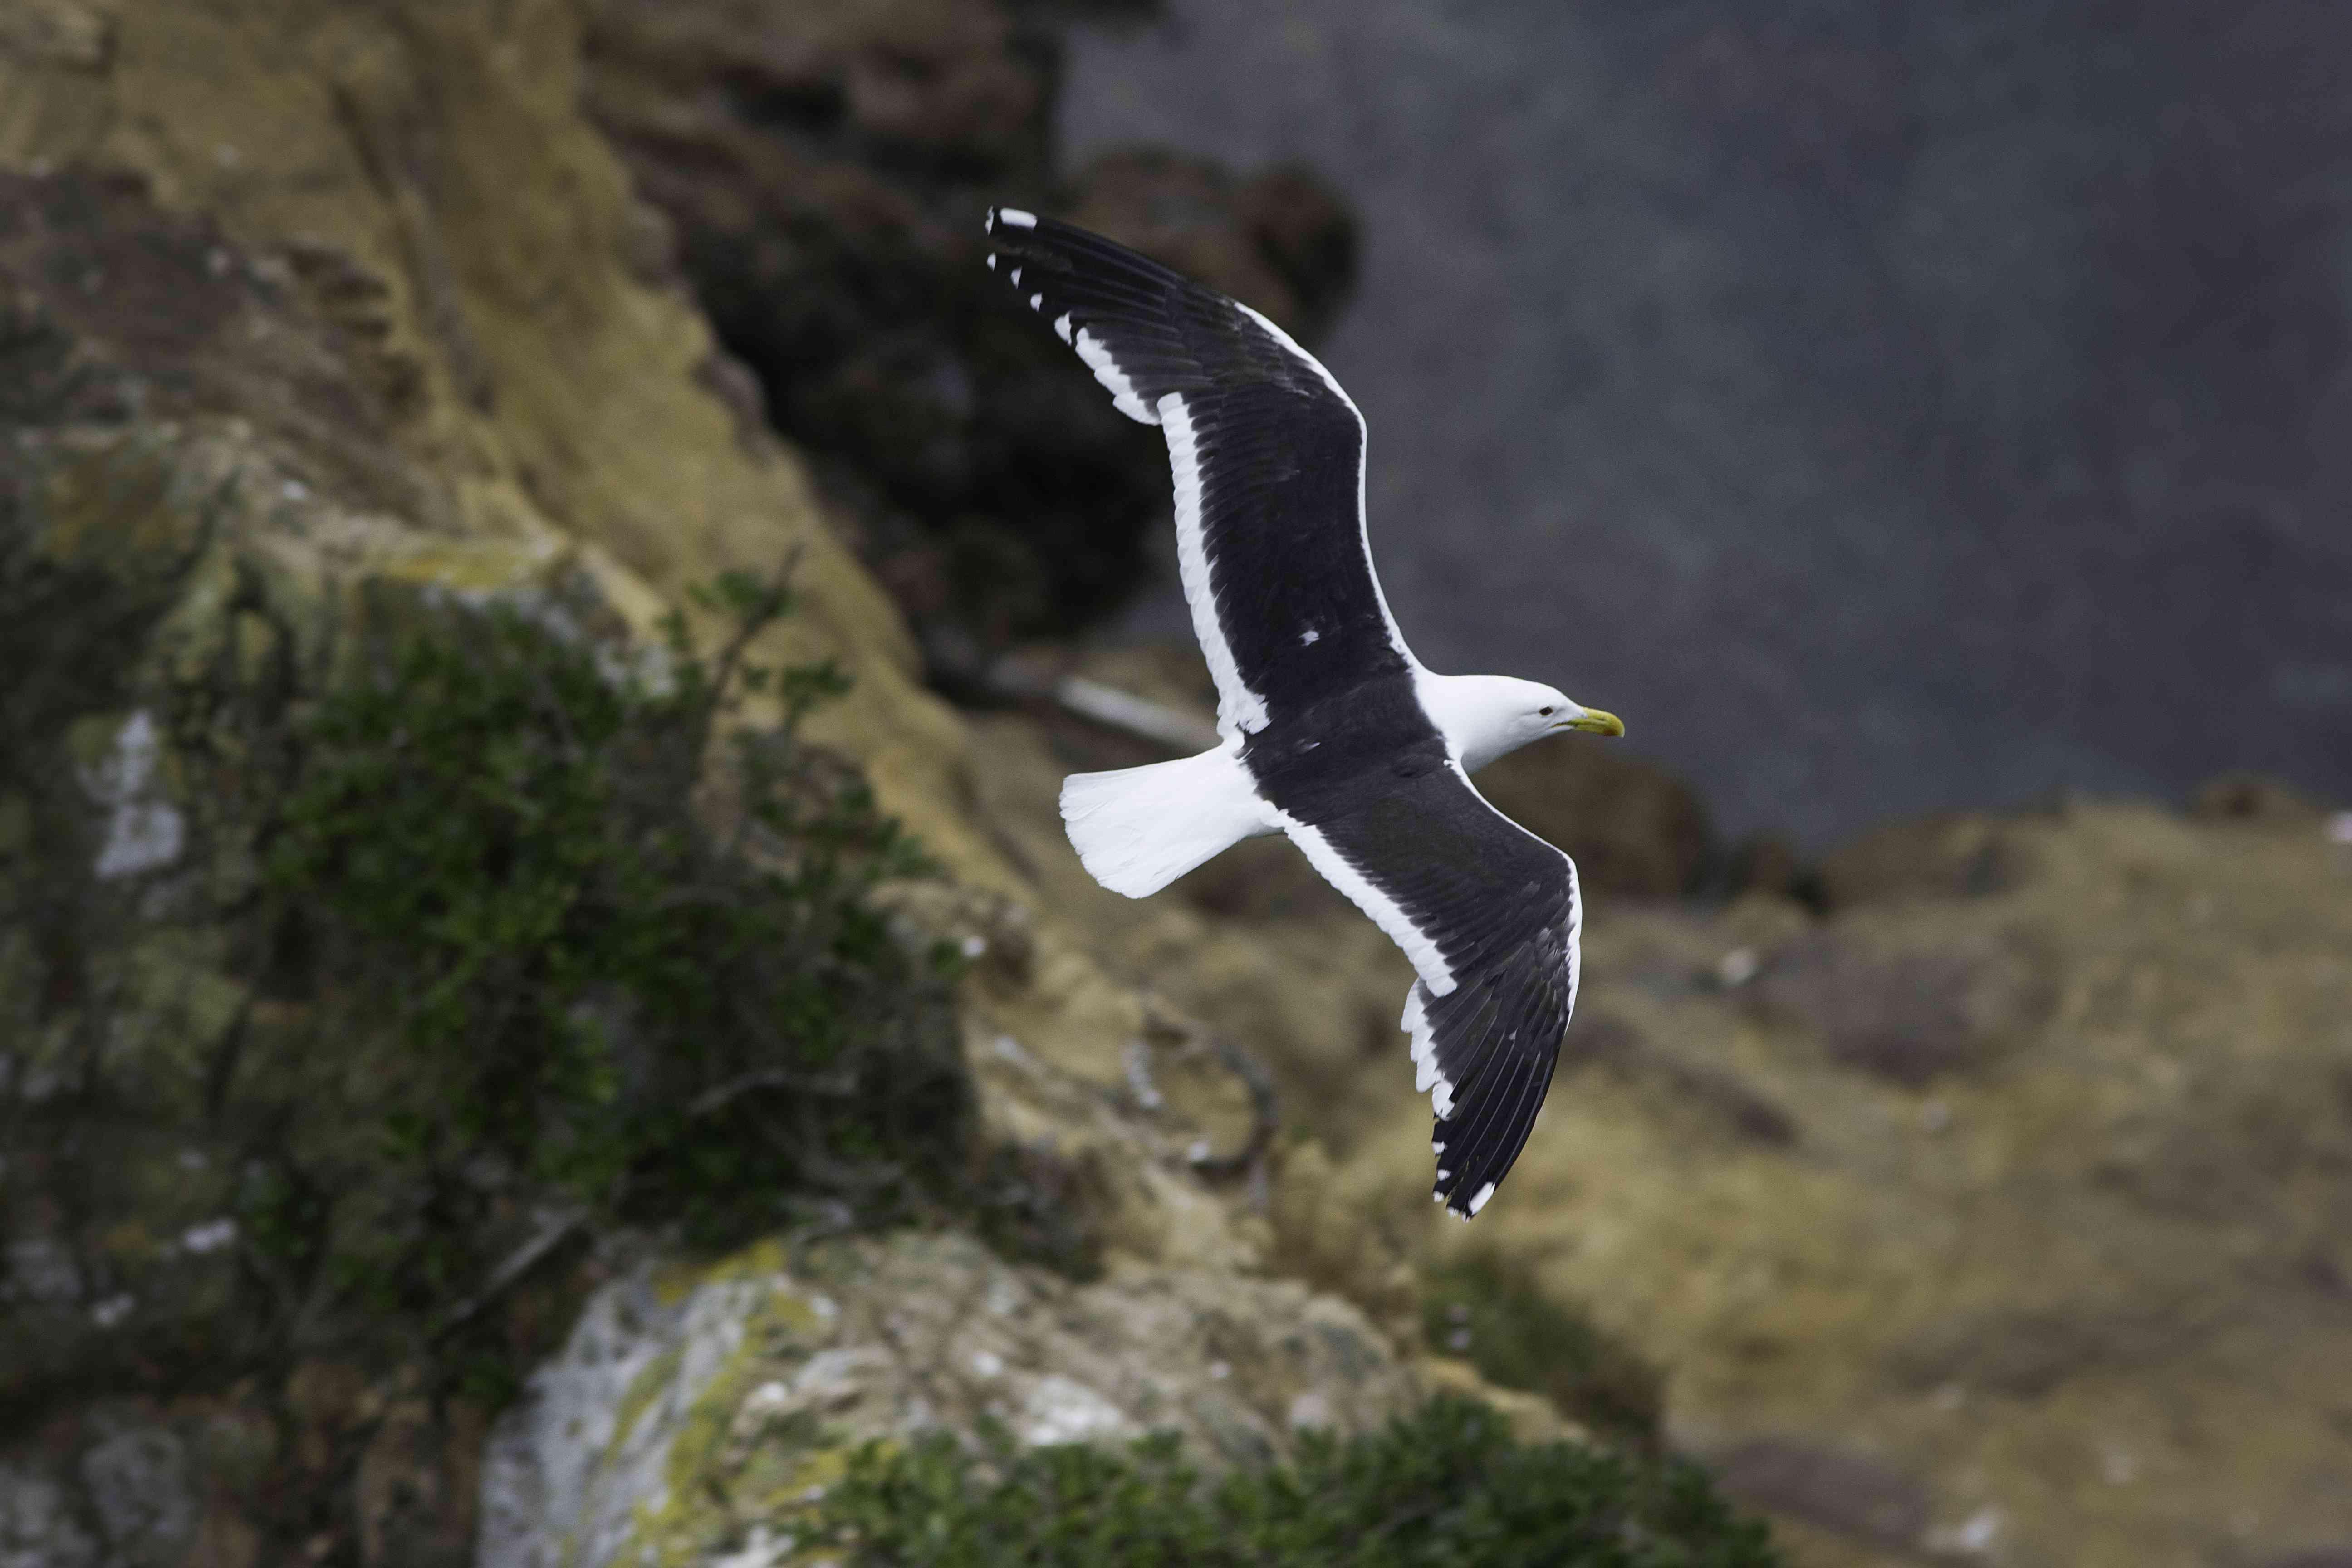 Black-backedgull(Larusmarinus)flying over cliff, Petone, NewZealand